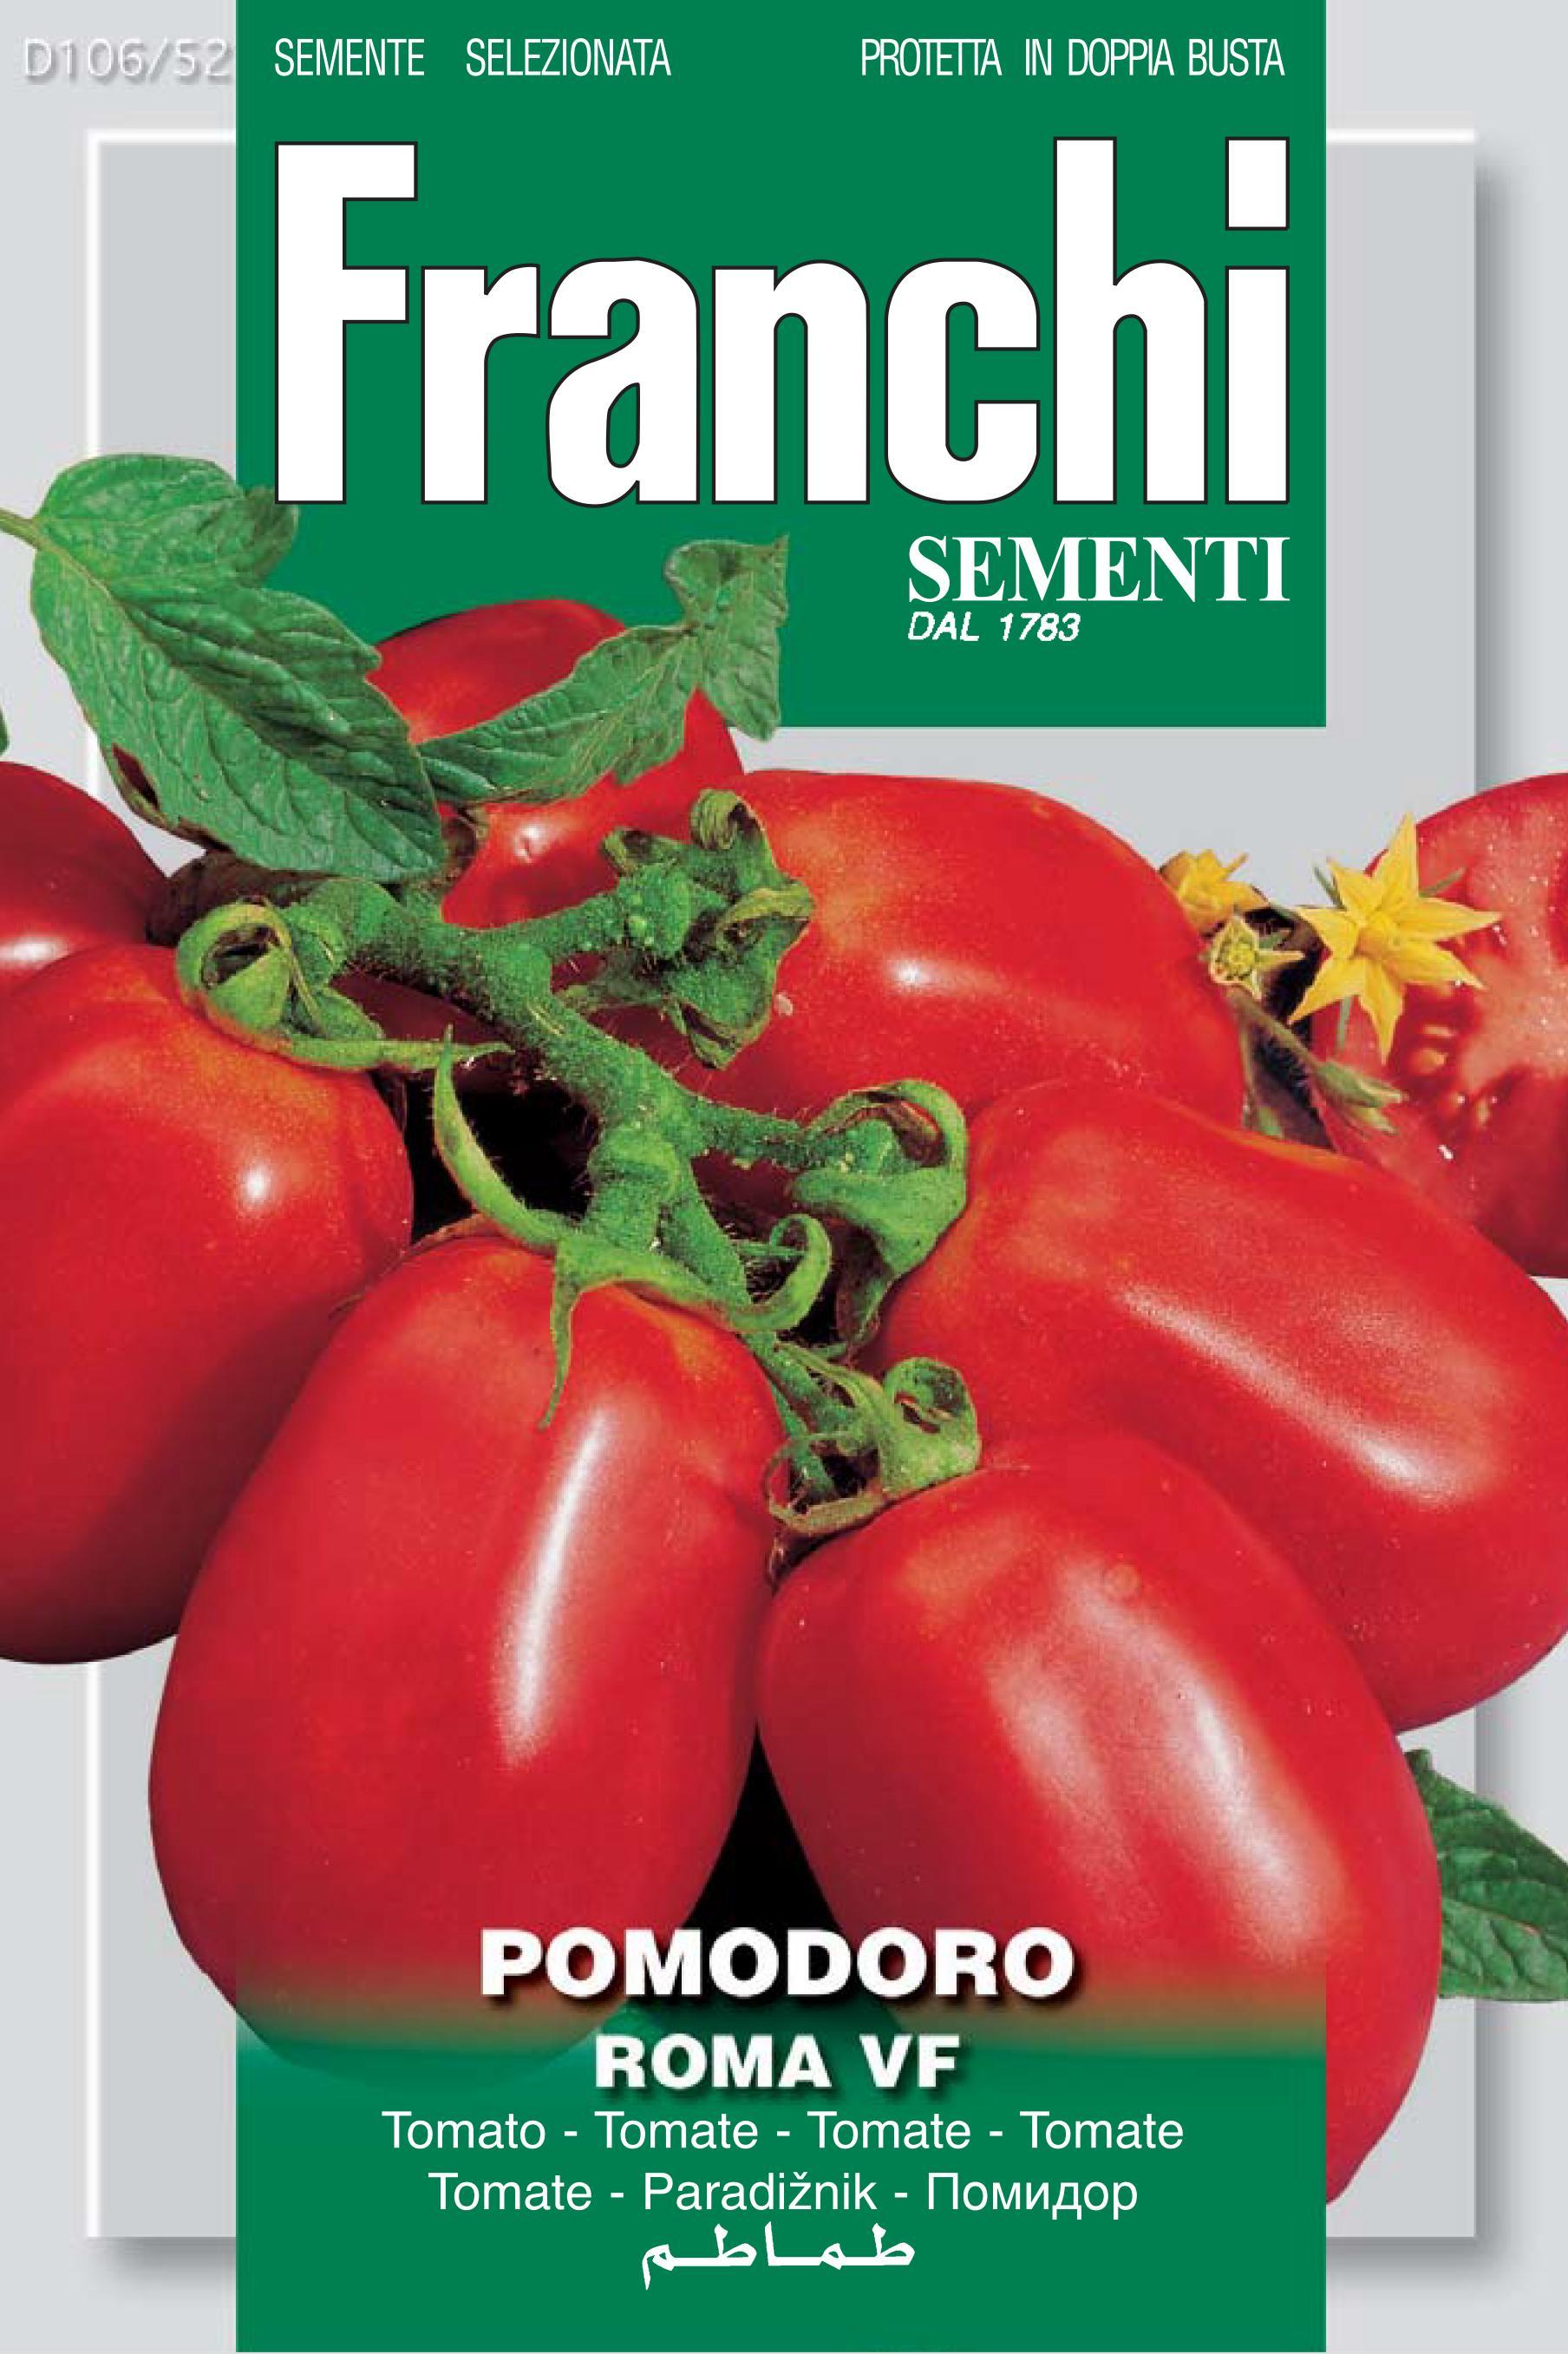 Tomato Roma VF - save 46p